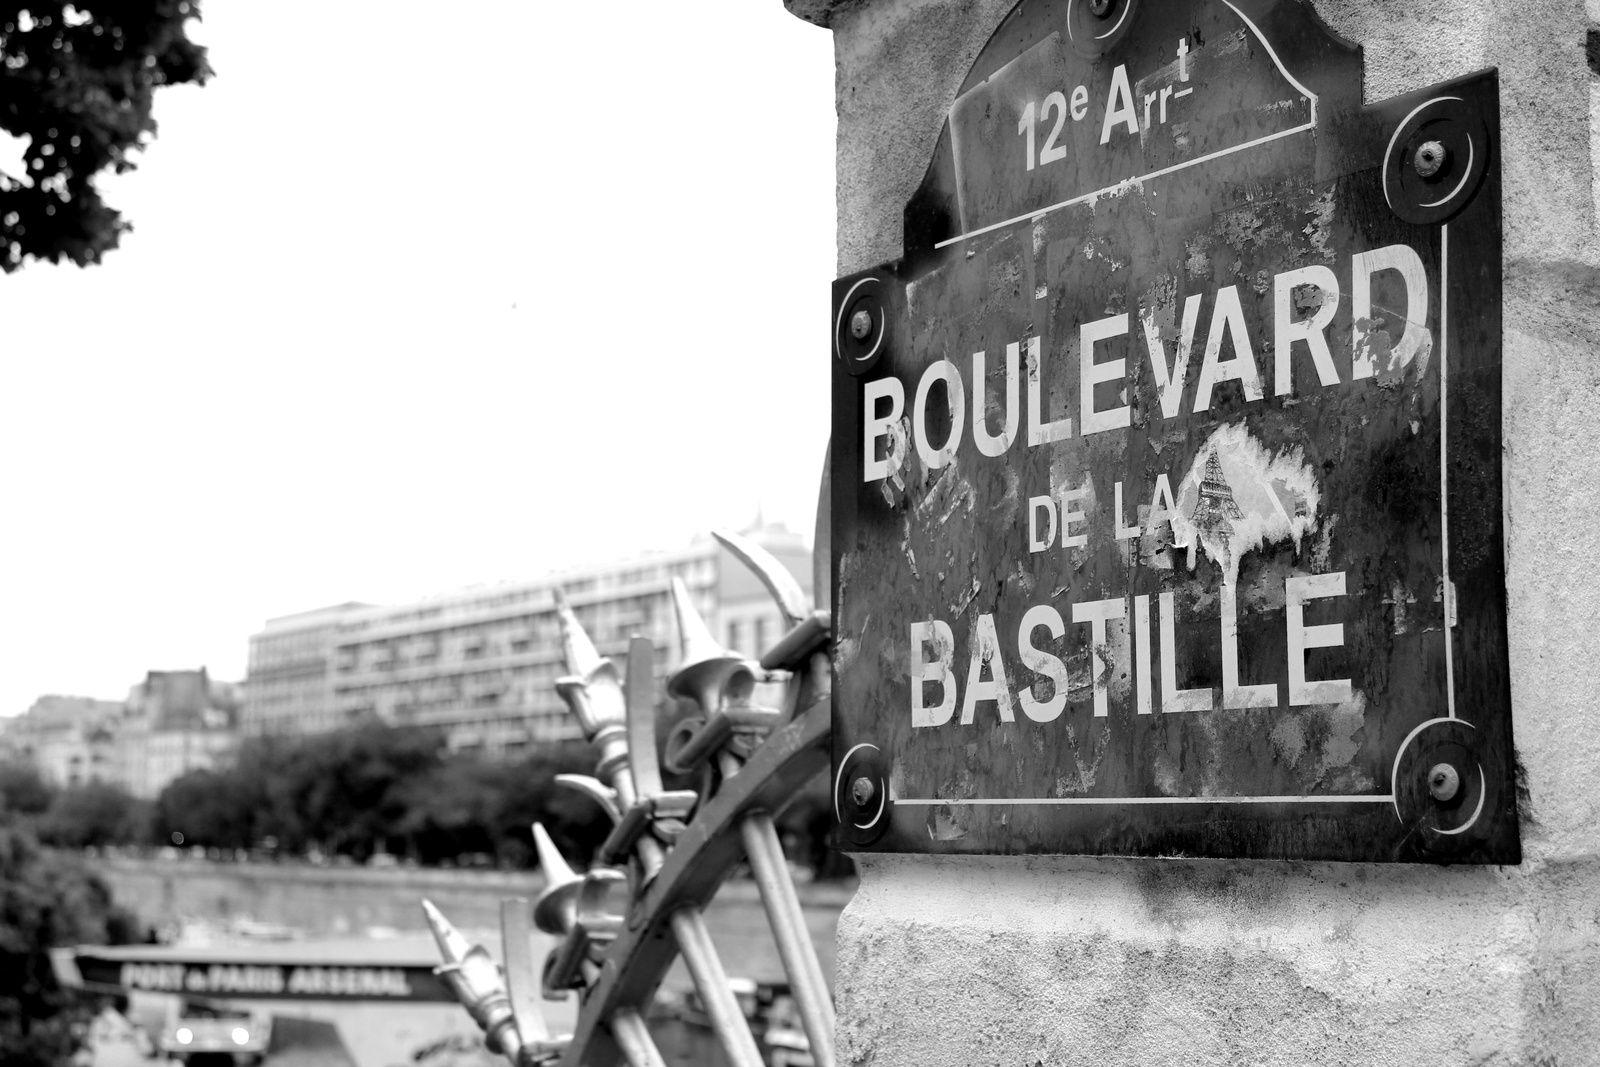 ça skate pas mal à Paris